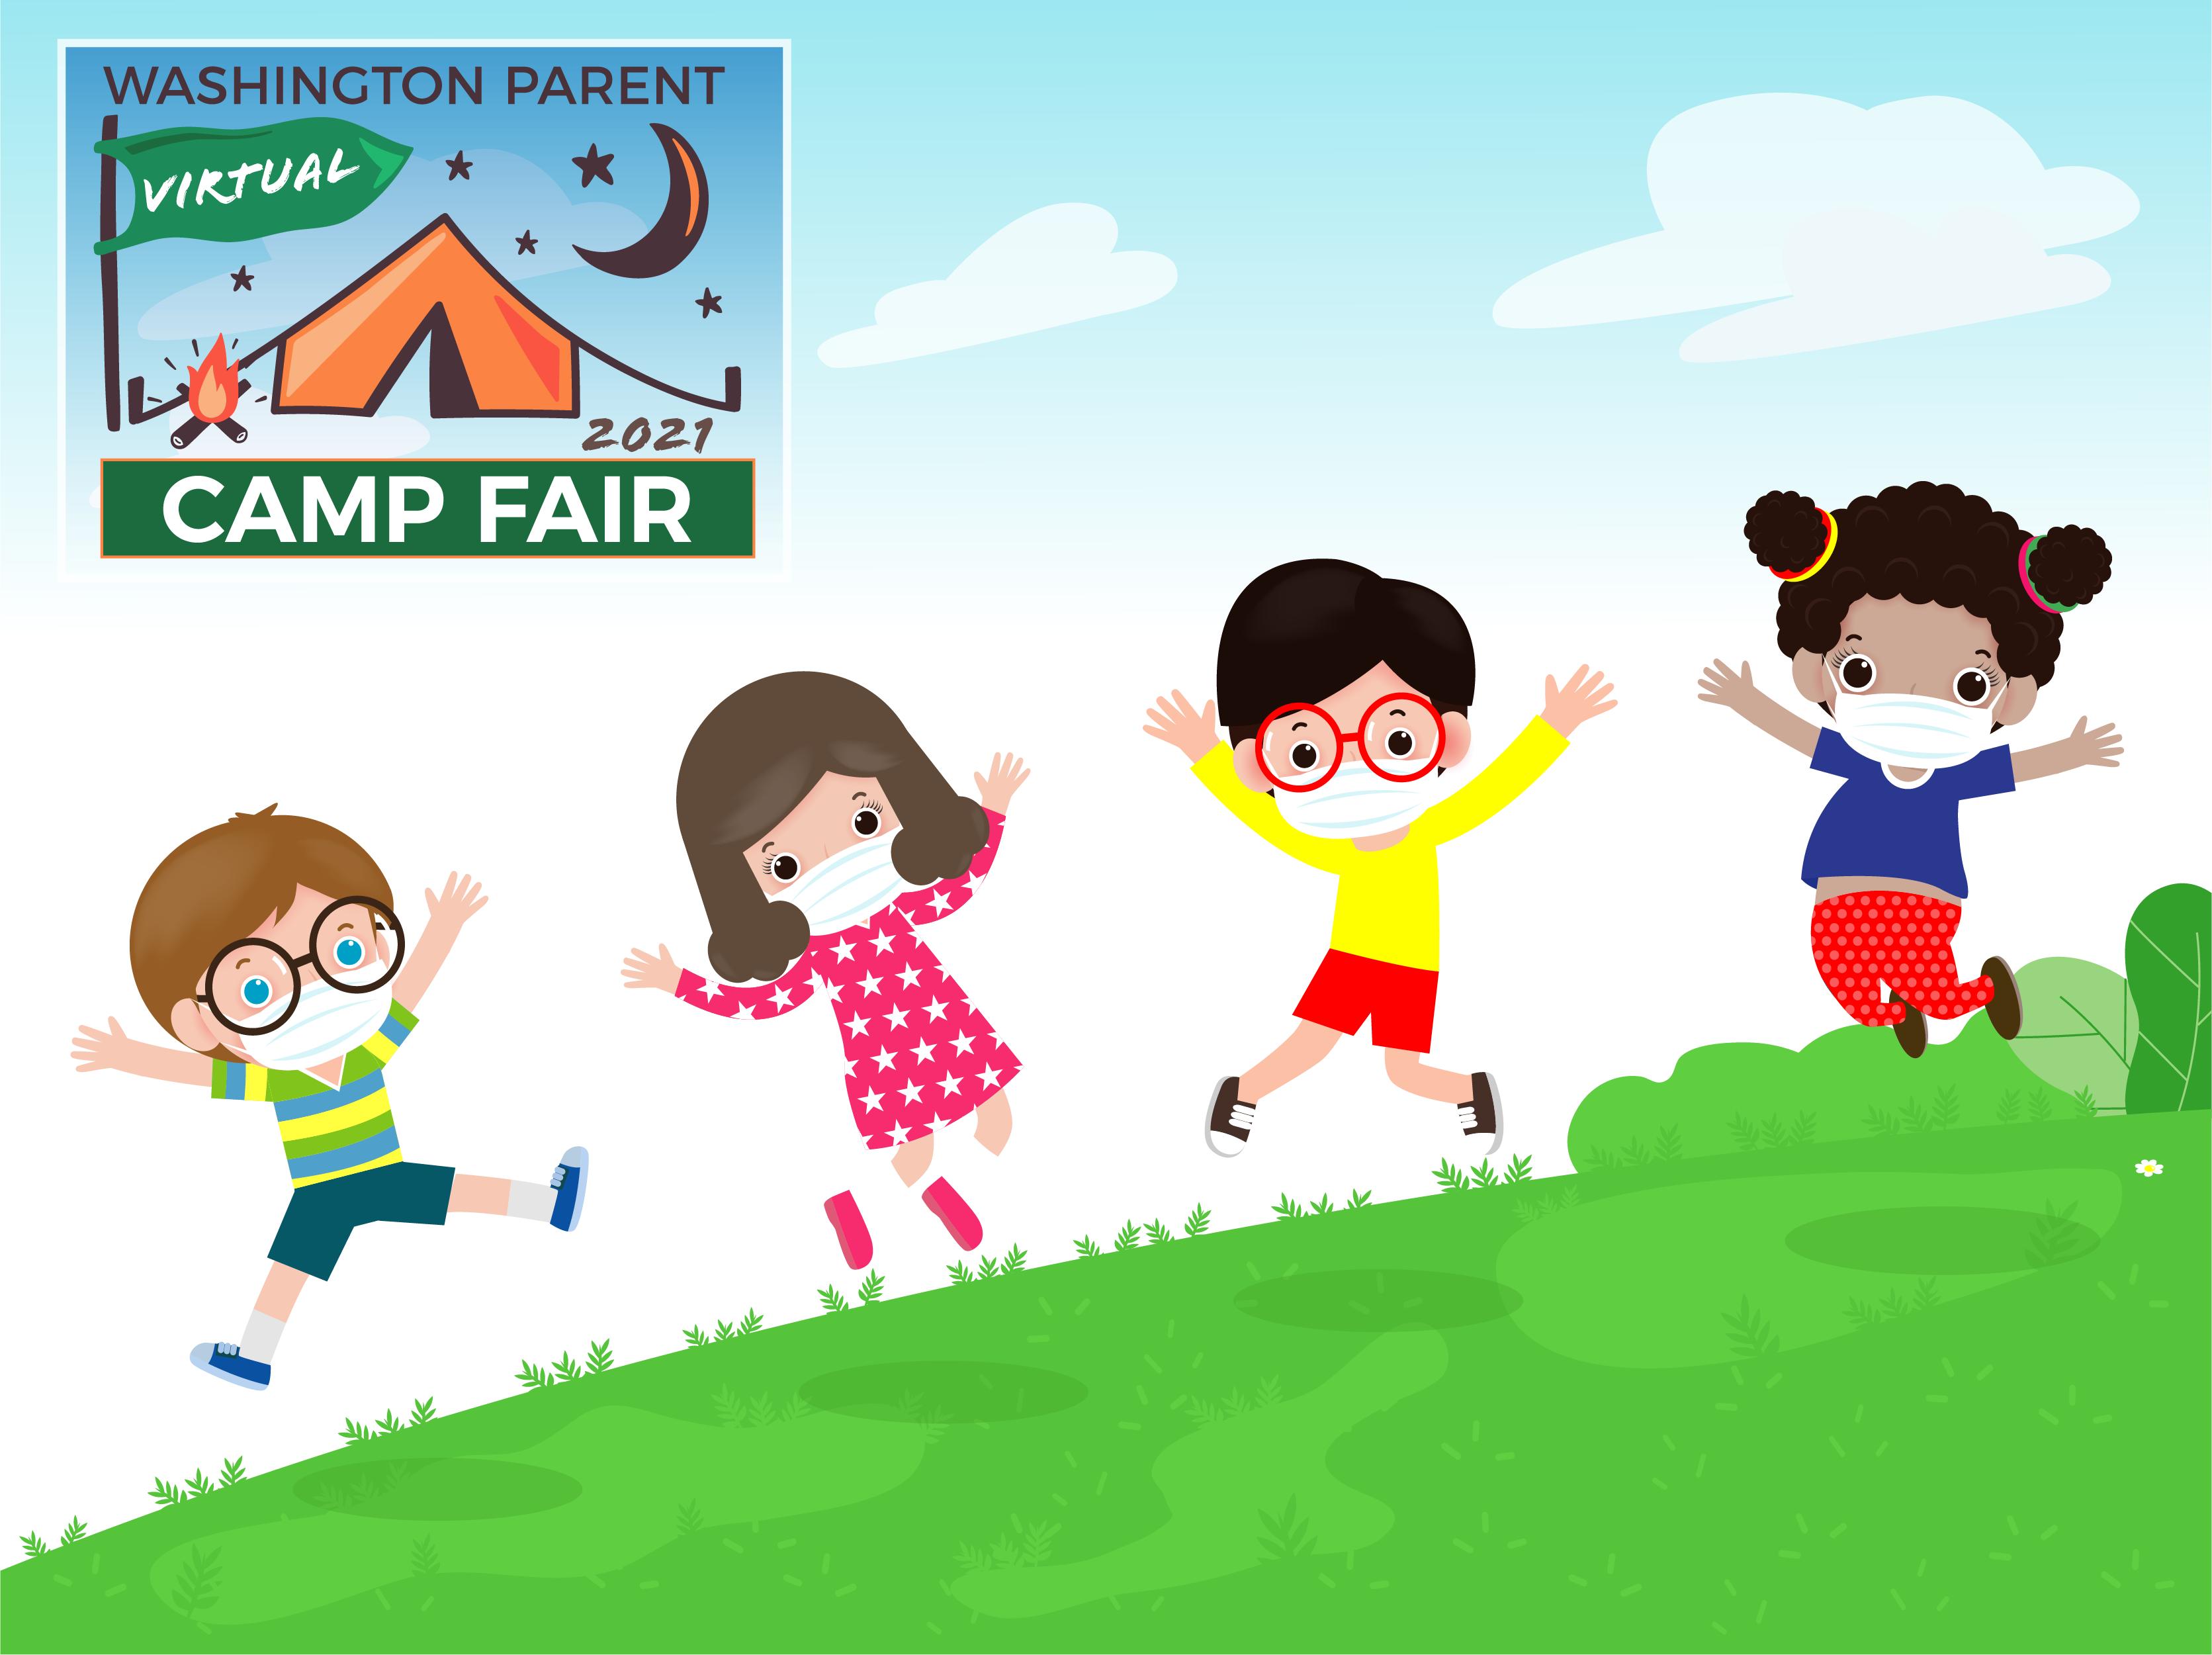 Washington Parent Virtual Camp Fair